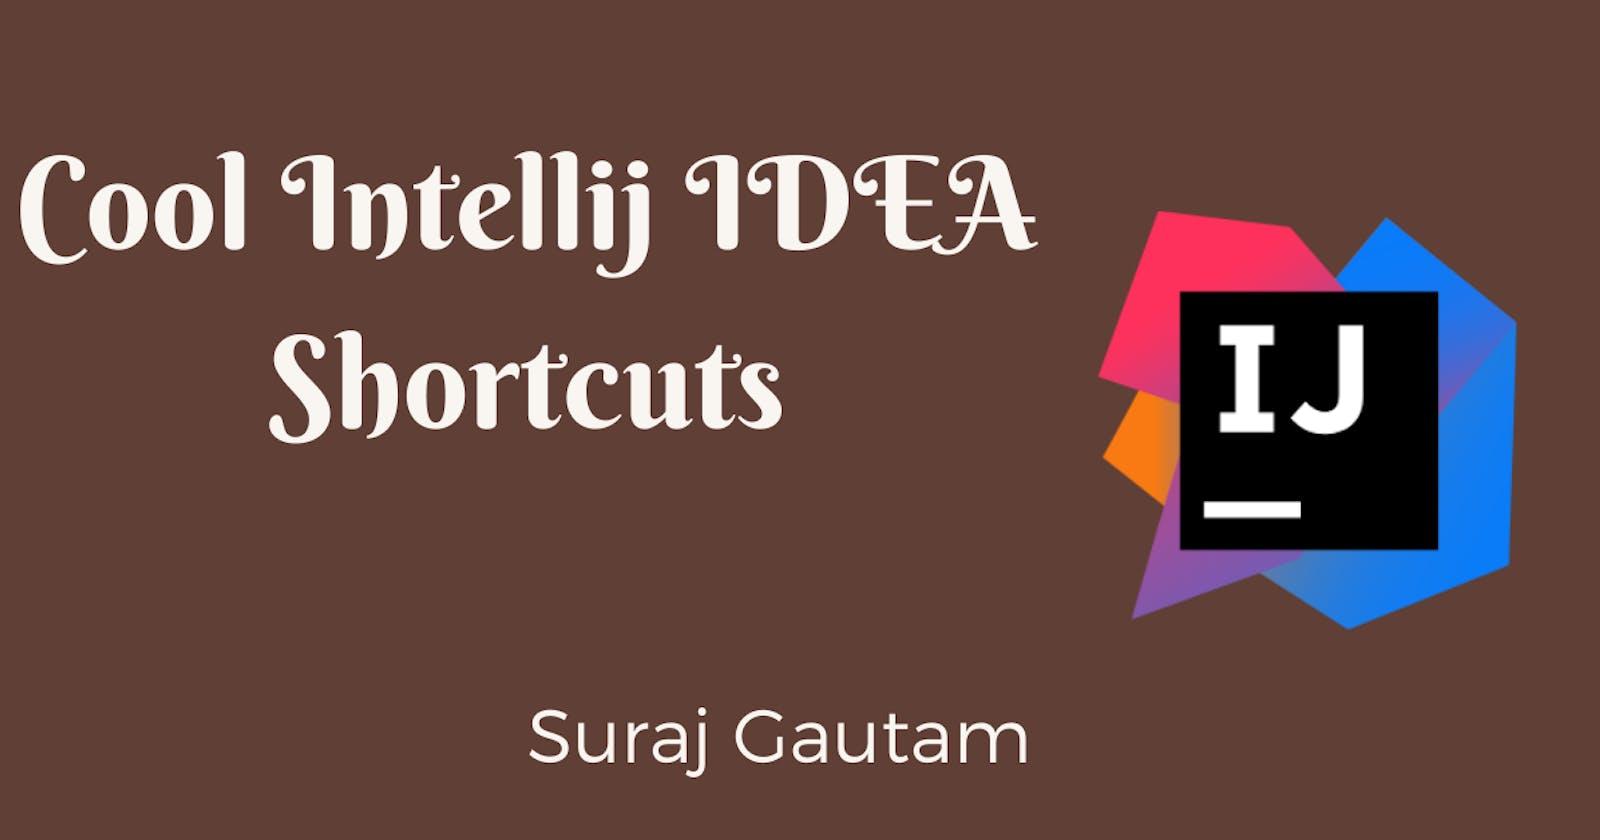 Cool Intellij IDEA Shortcuts